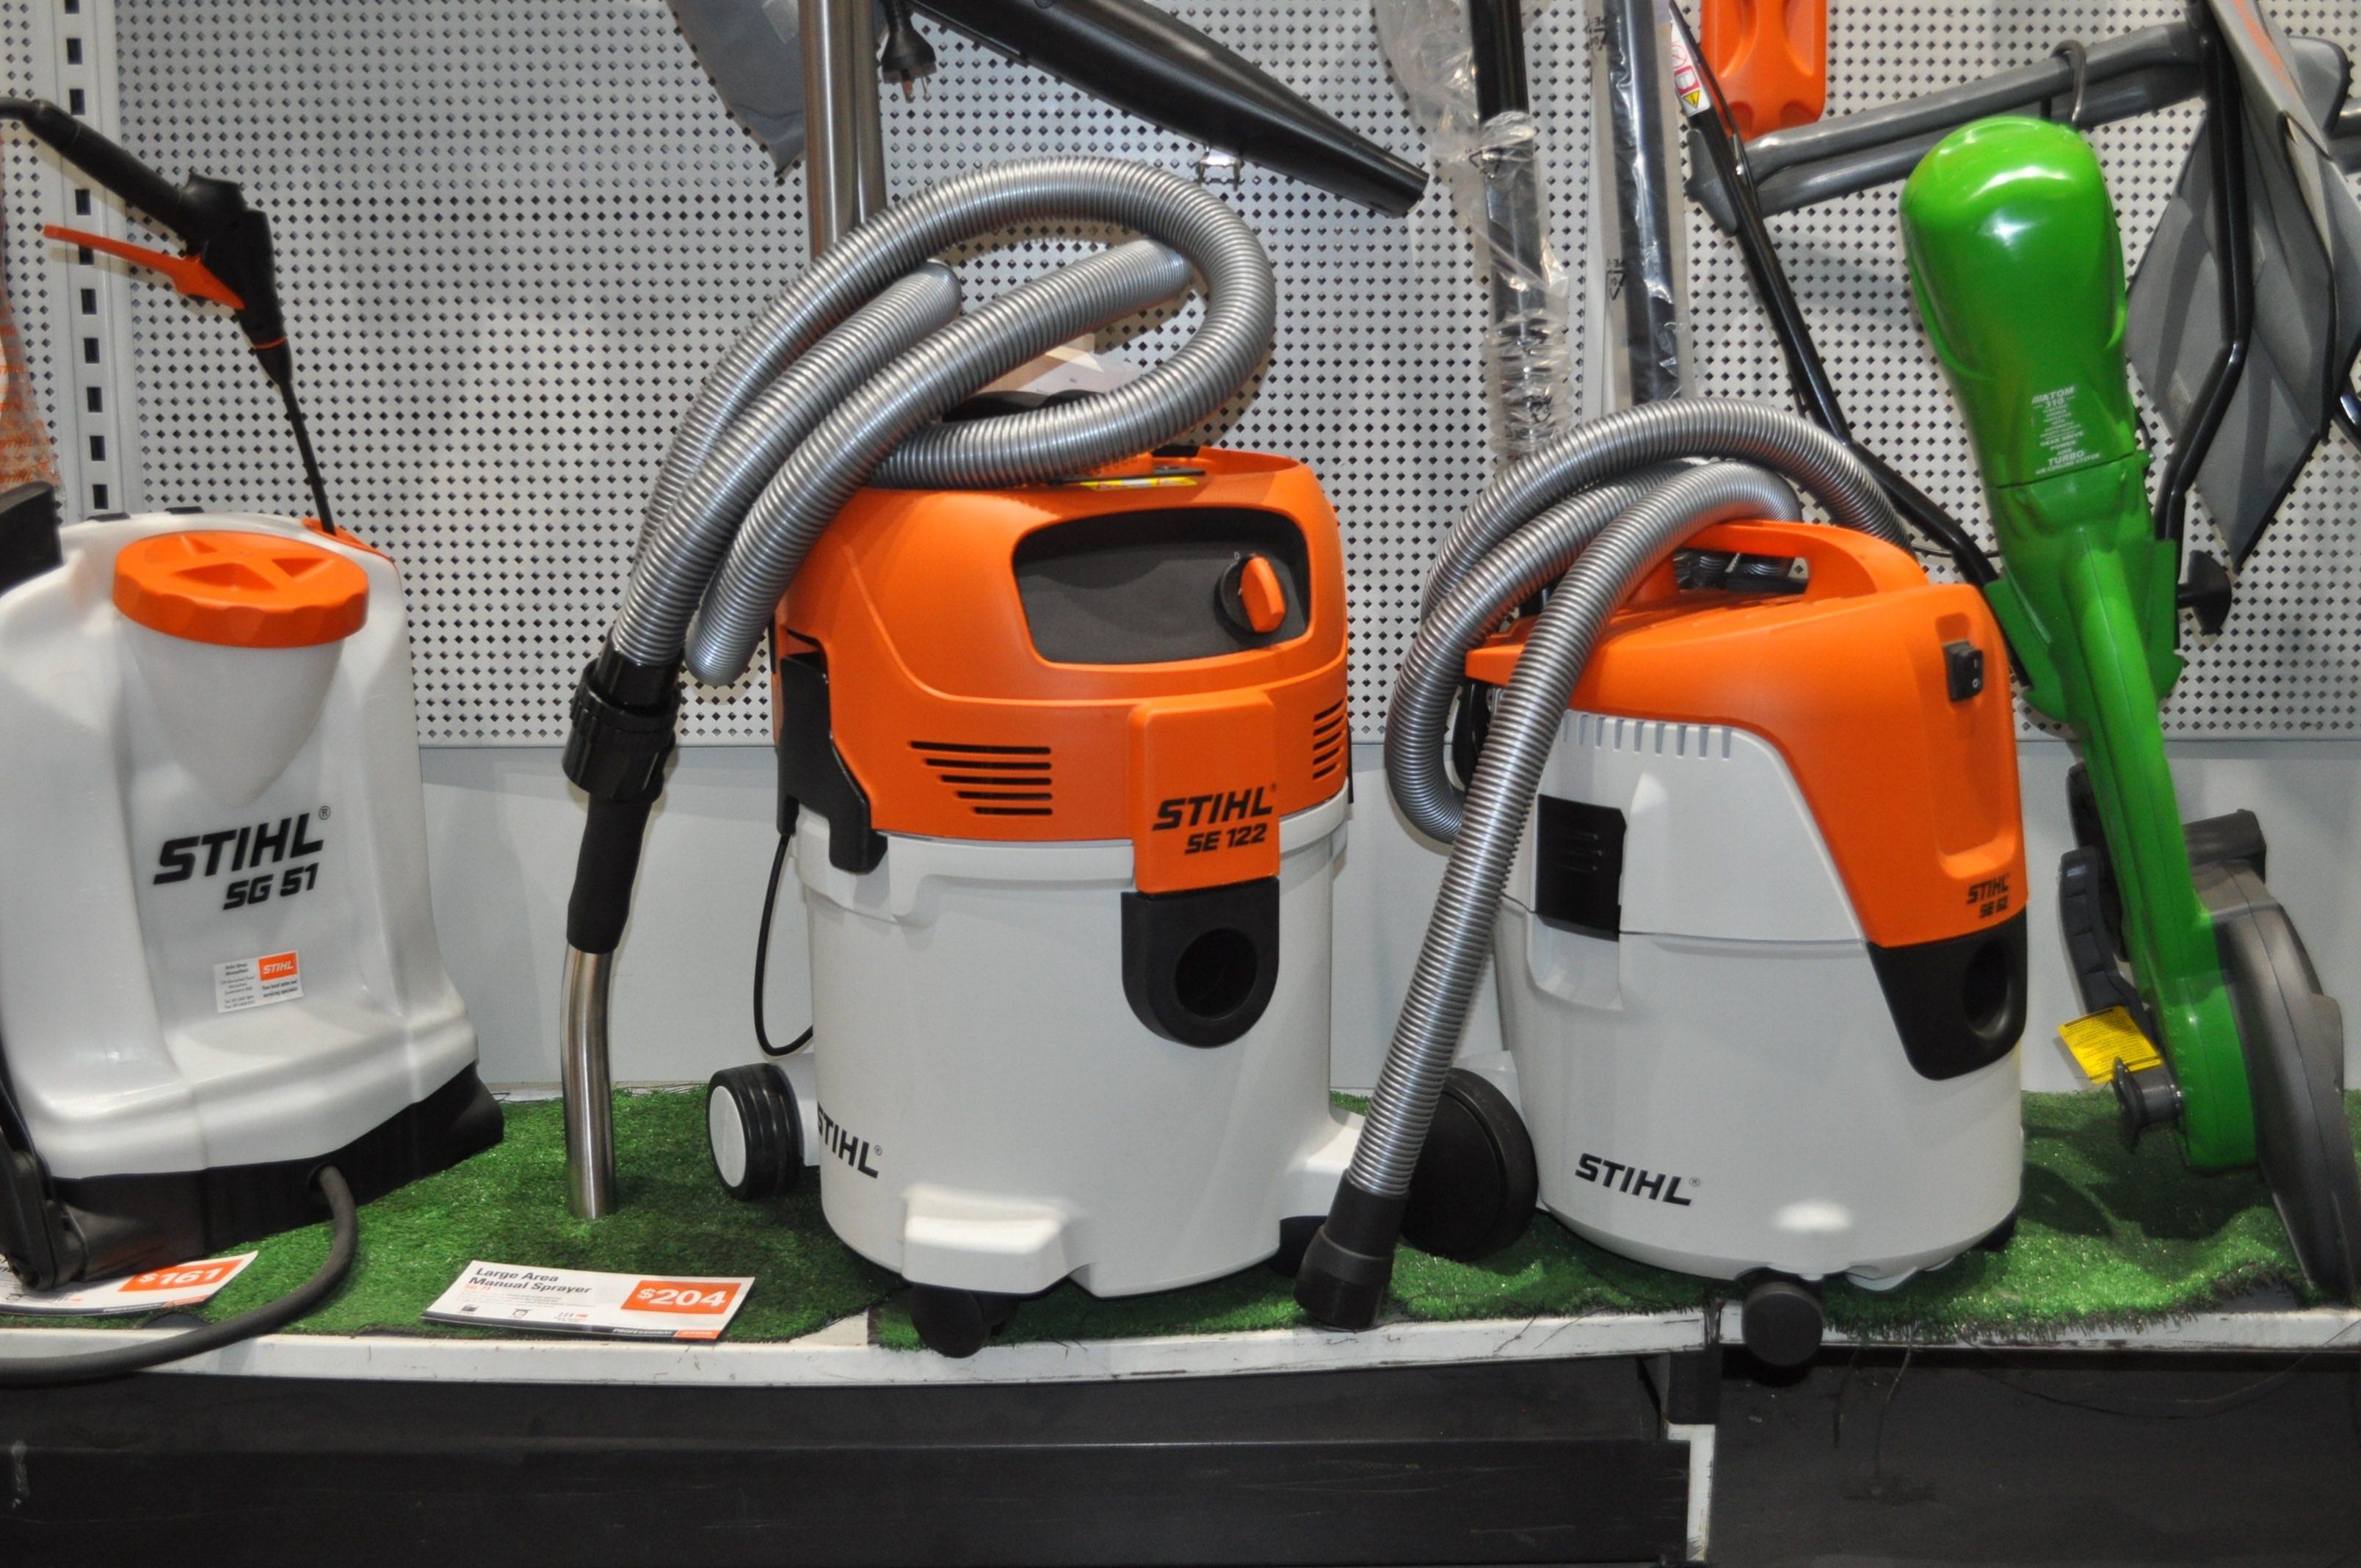 Stihl-Large-Manual-Sprayer-1024x680